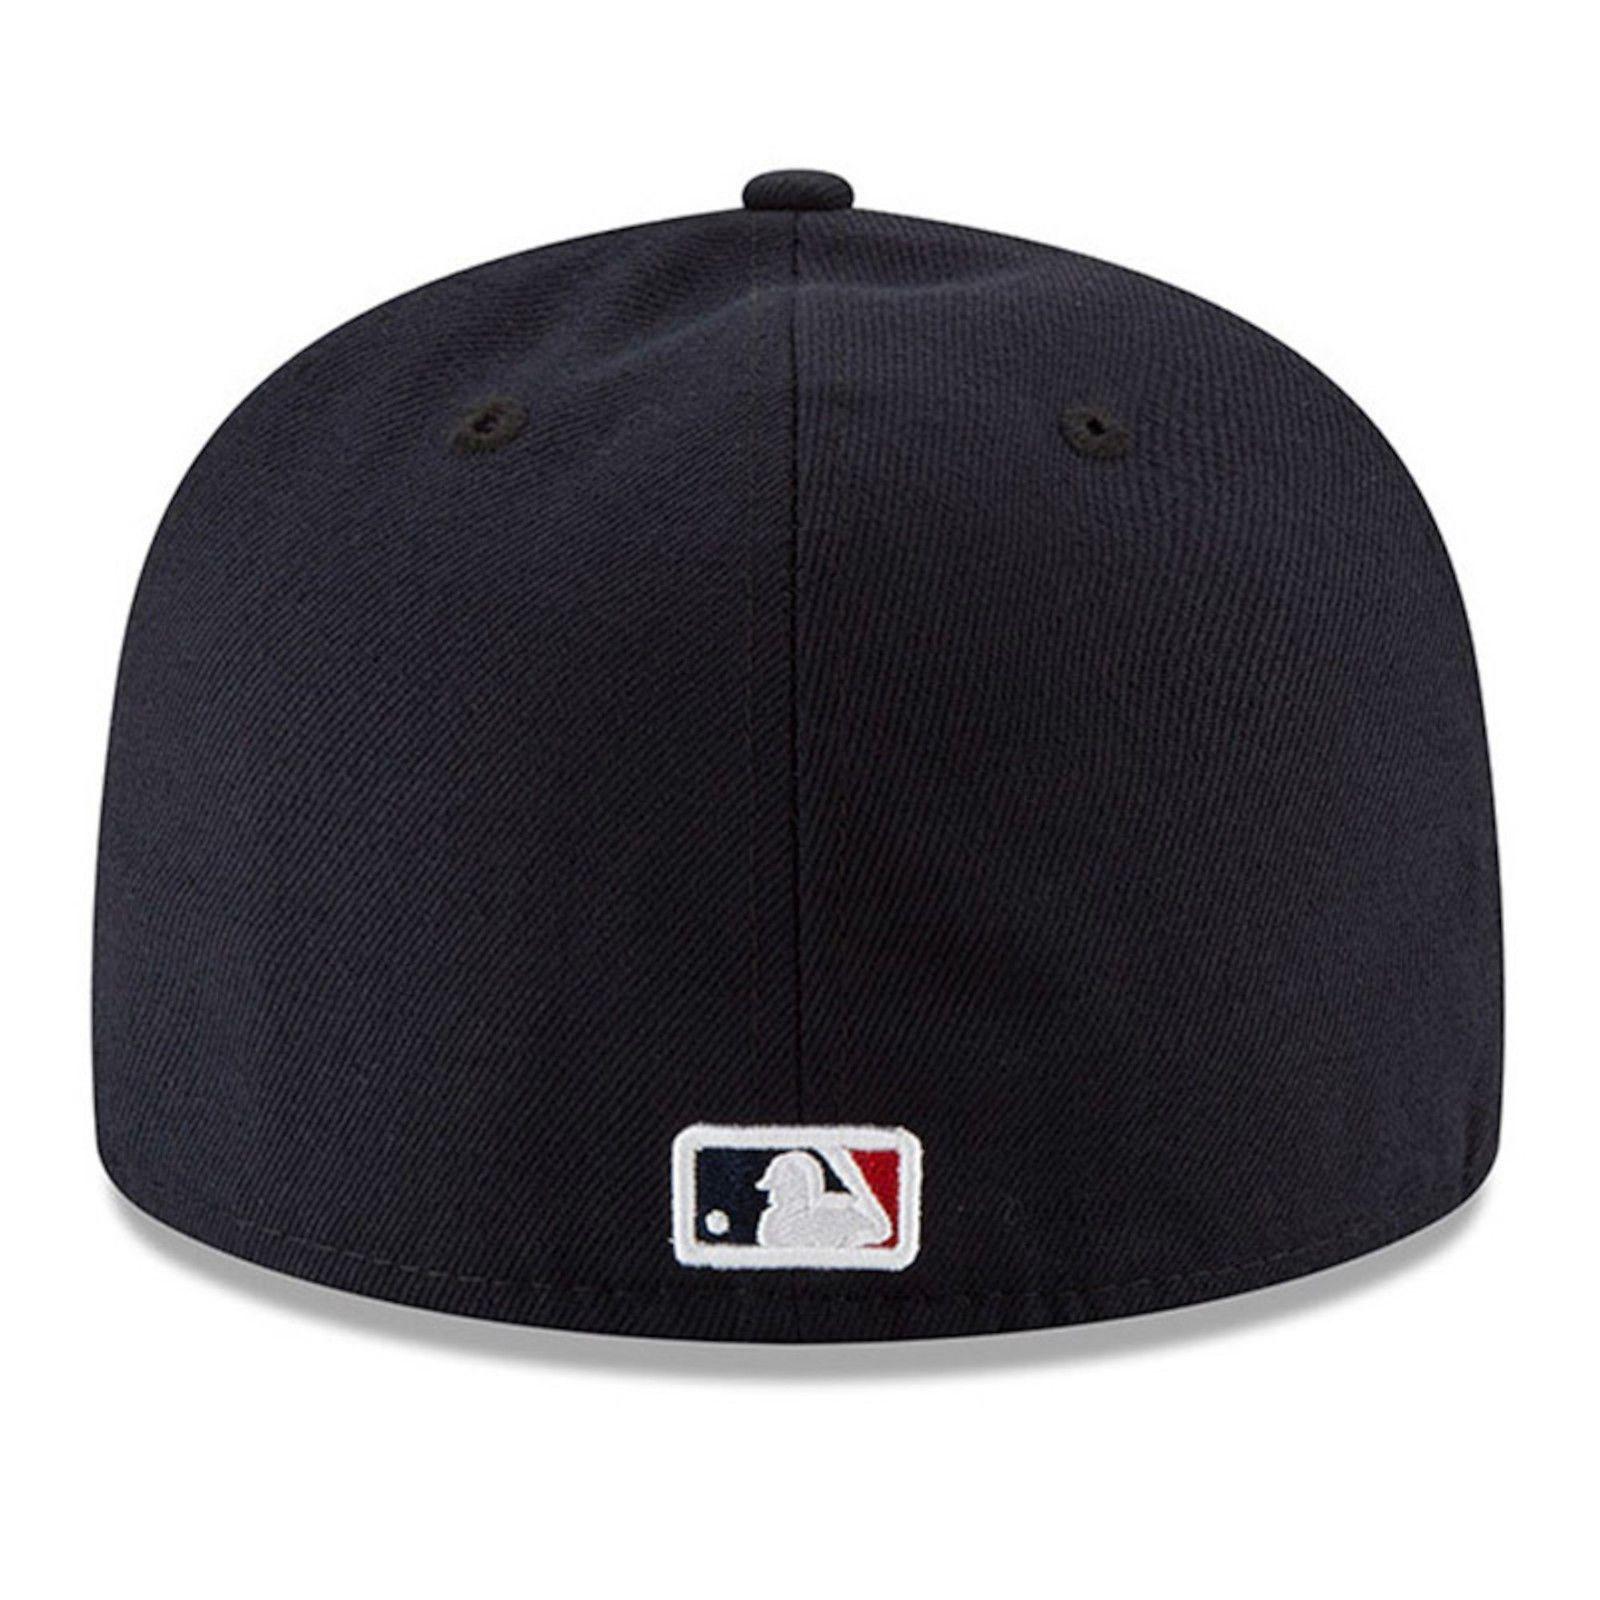 size 40 b6d39 98251 ... american league champions locker room 39thirty flex hat gray 5e0fa  2d6d0  where to buy 2018 boston red sox new era 59fifty mlb world series on  field ...